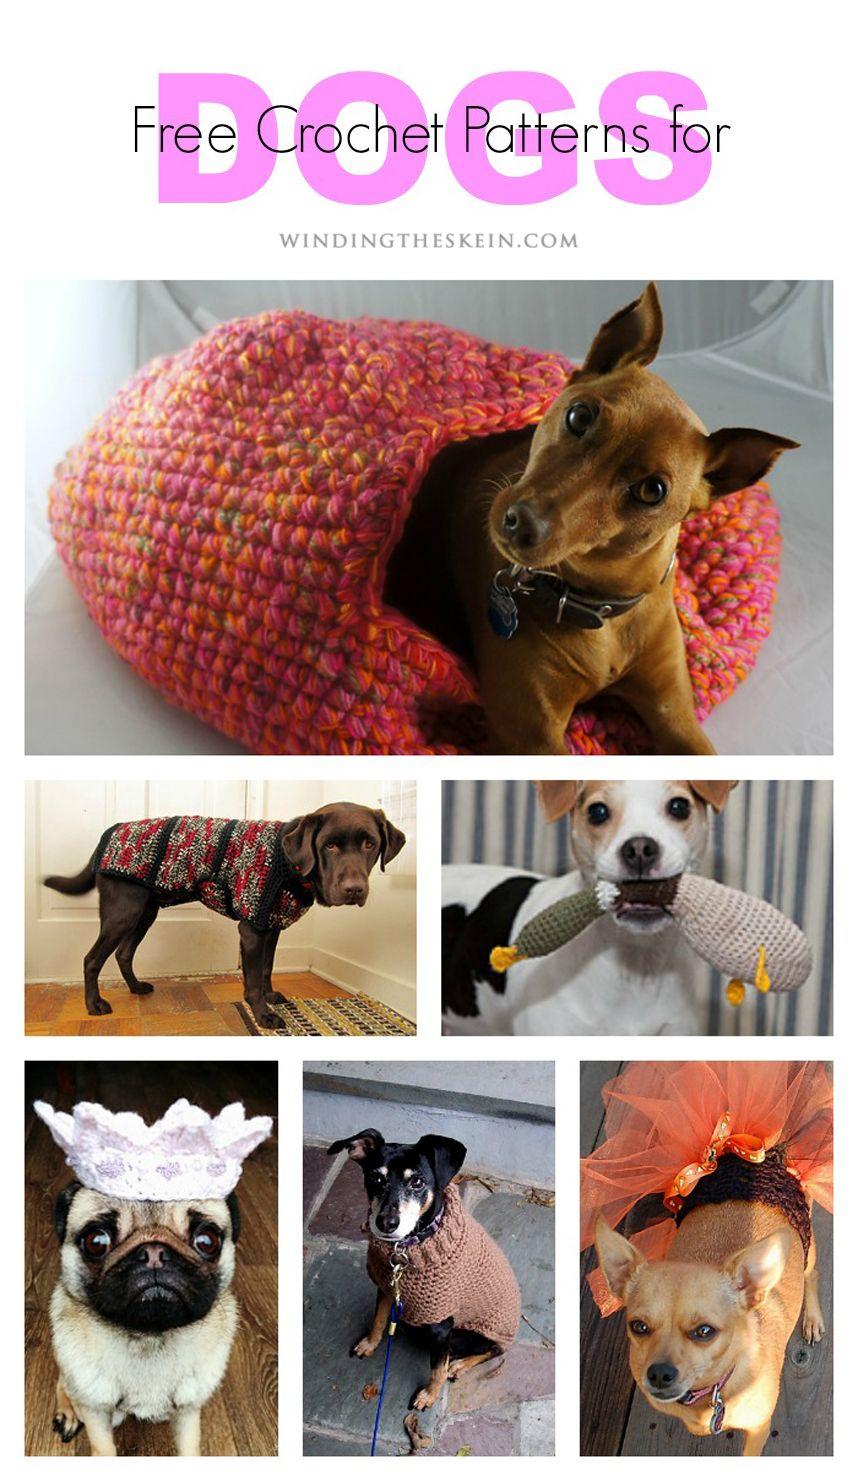 23 Free Crochet Patterns for Household Pets | Free crochet ...